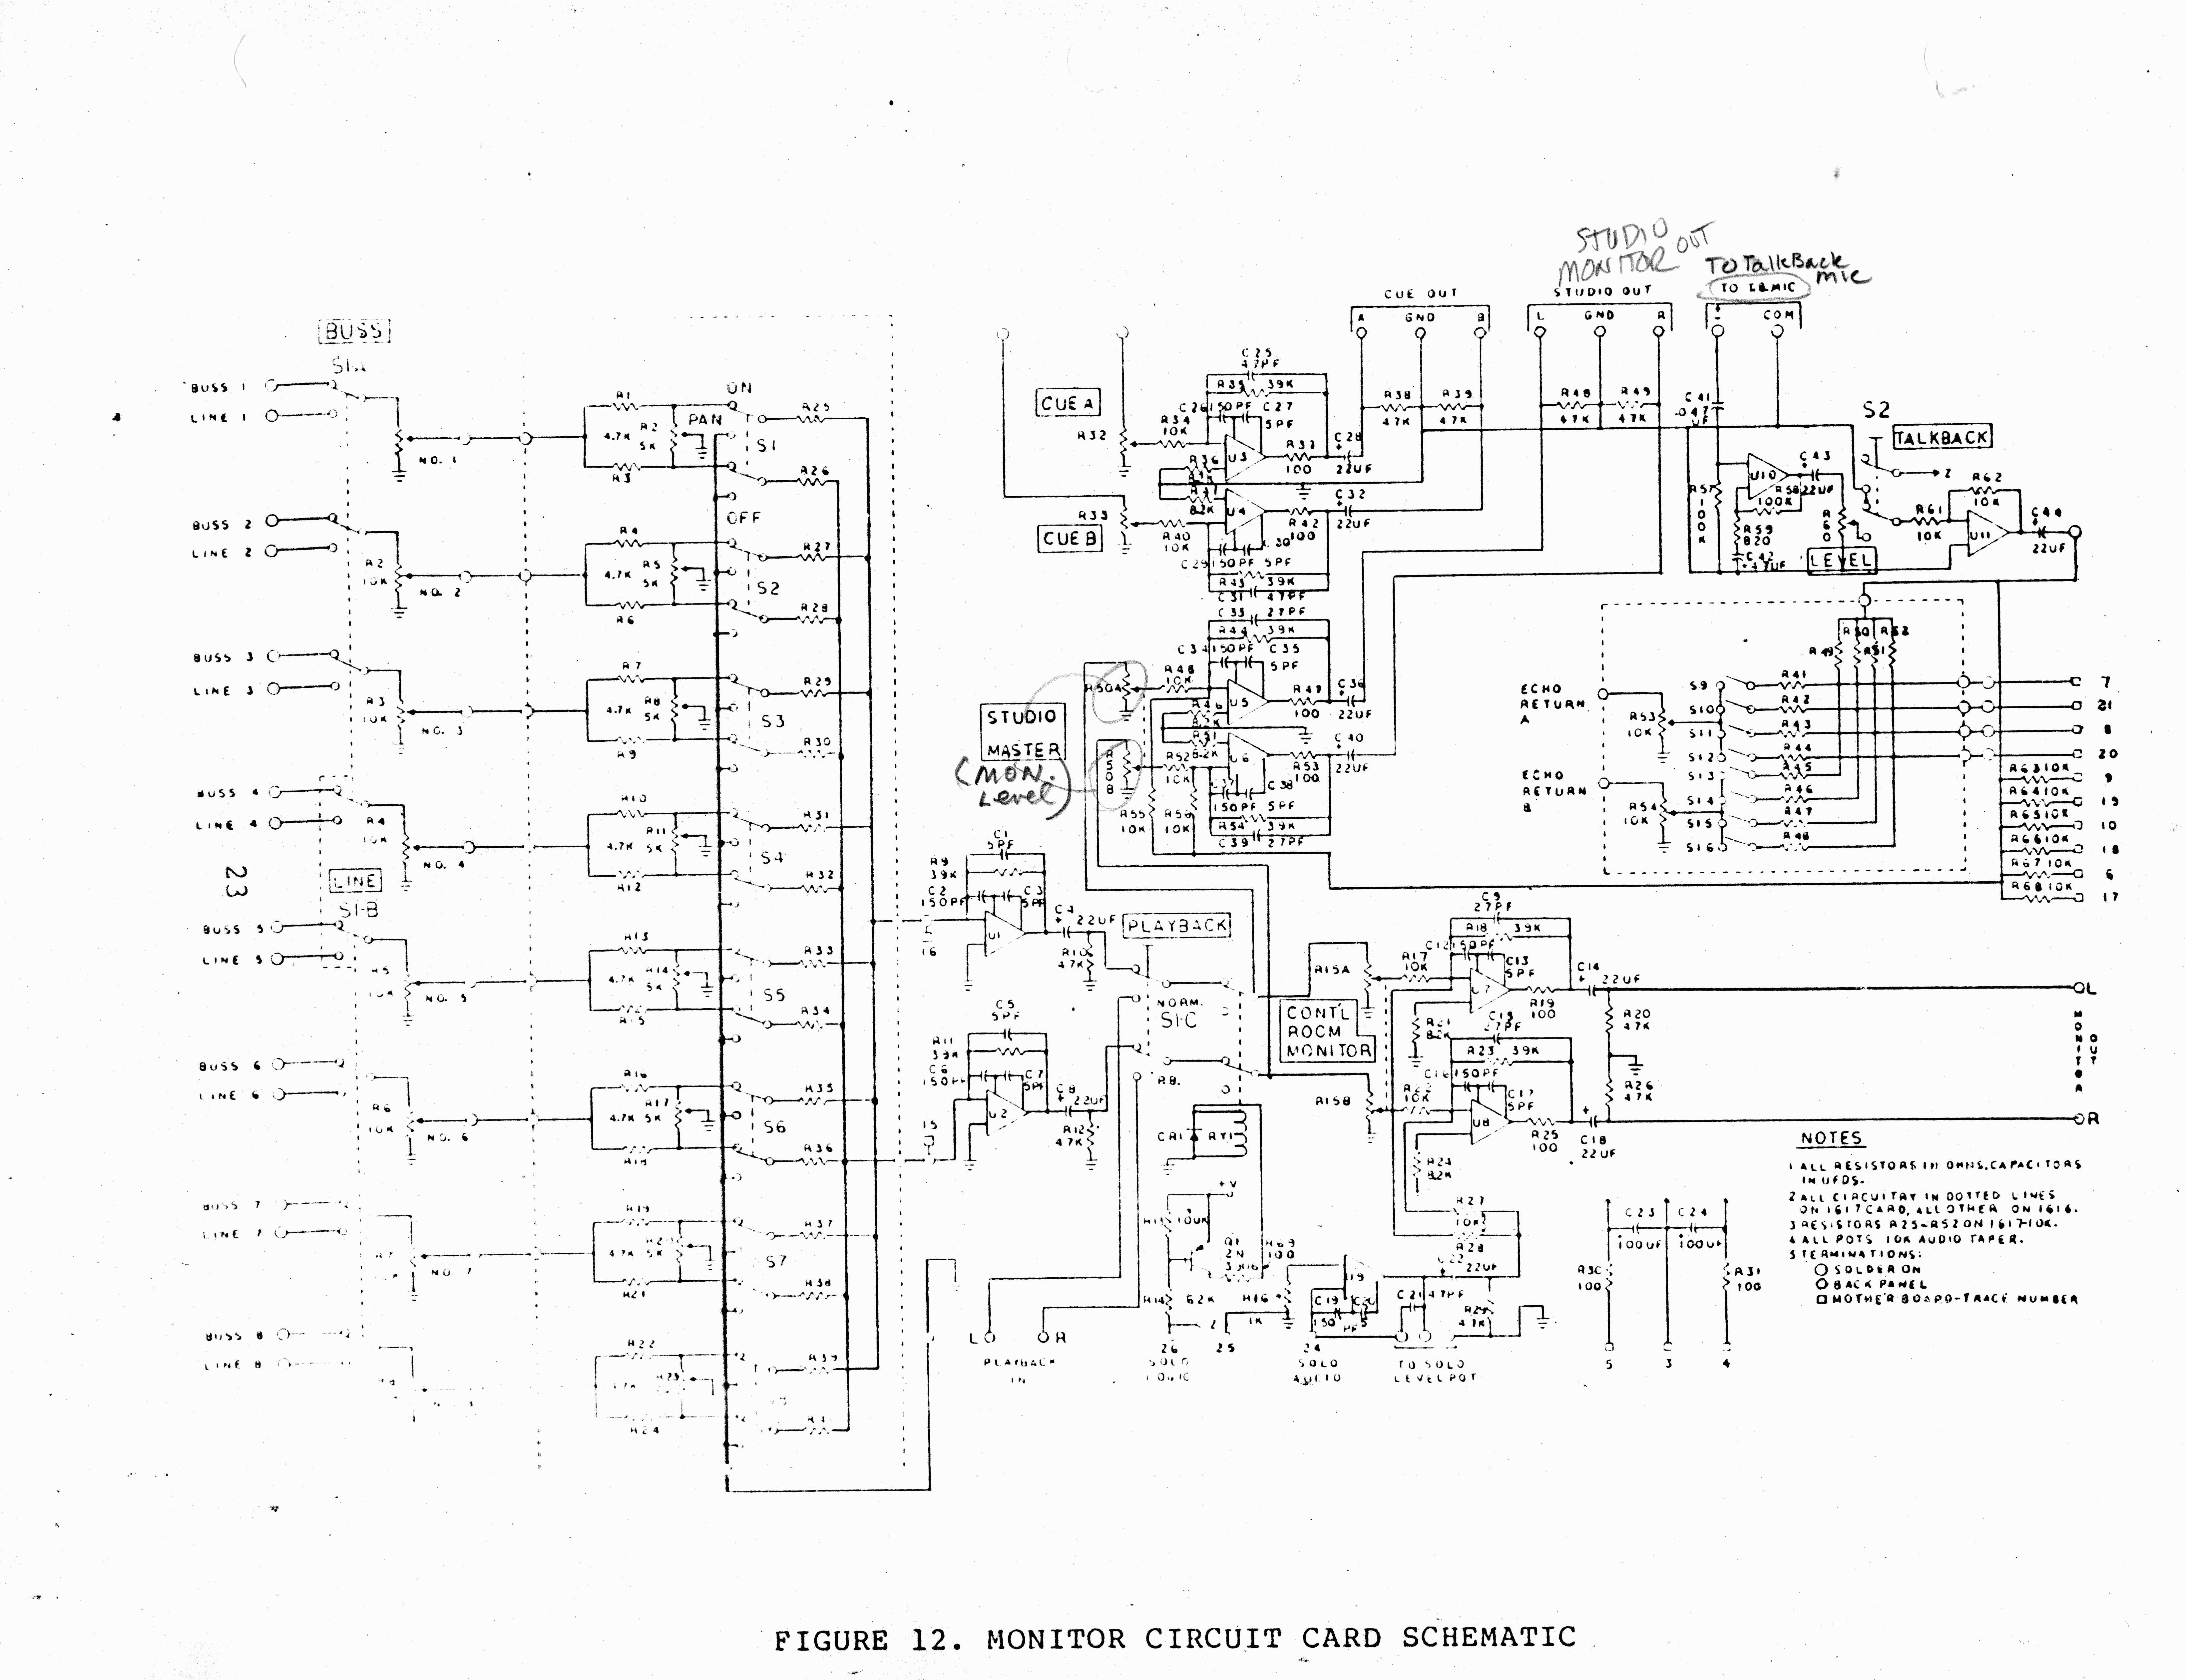 Quantum Audio Labs Gamma Console Vintage Silvertone Wiring Diagram Http Bolstadnet Qm 16820schematic20101020card 16820schematic20buss20outpu Ts